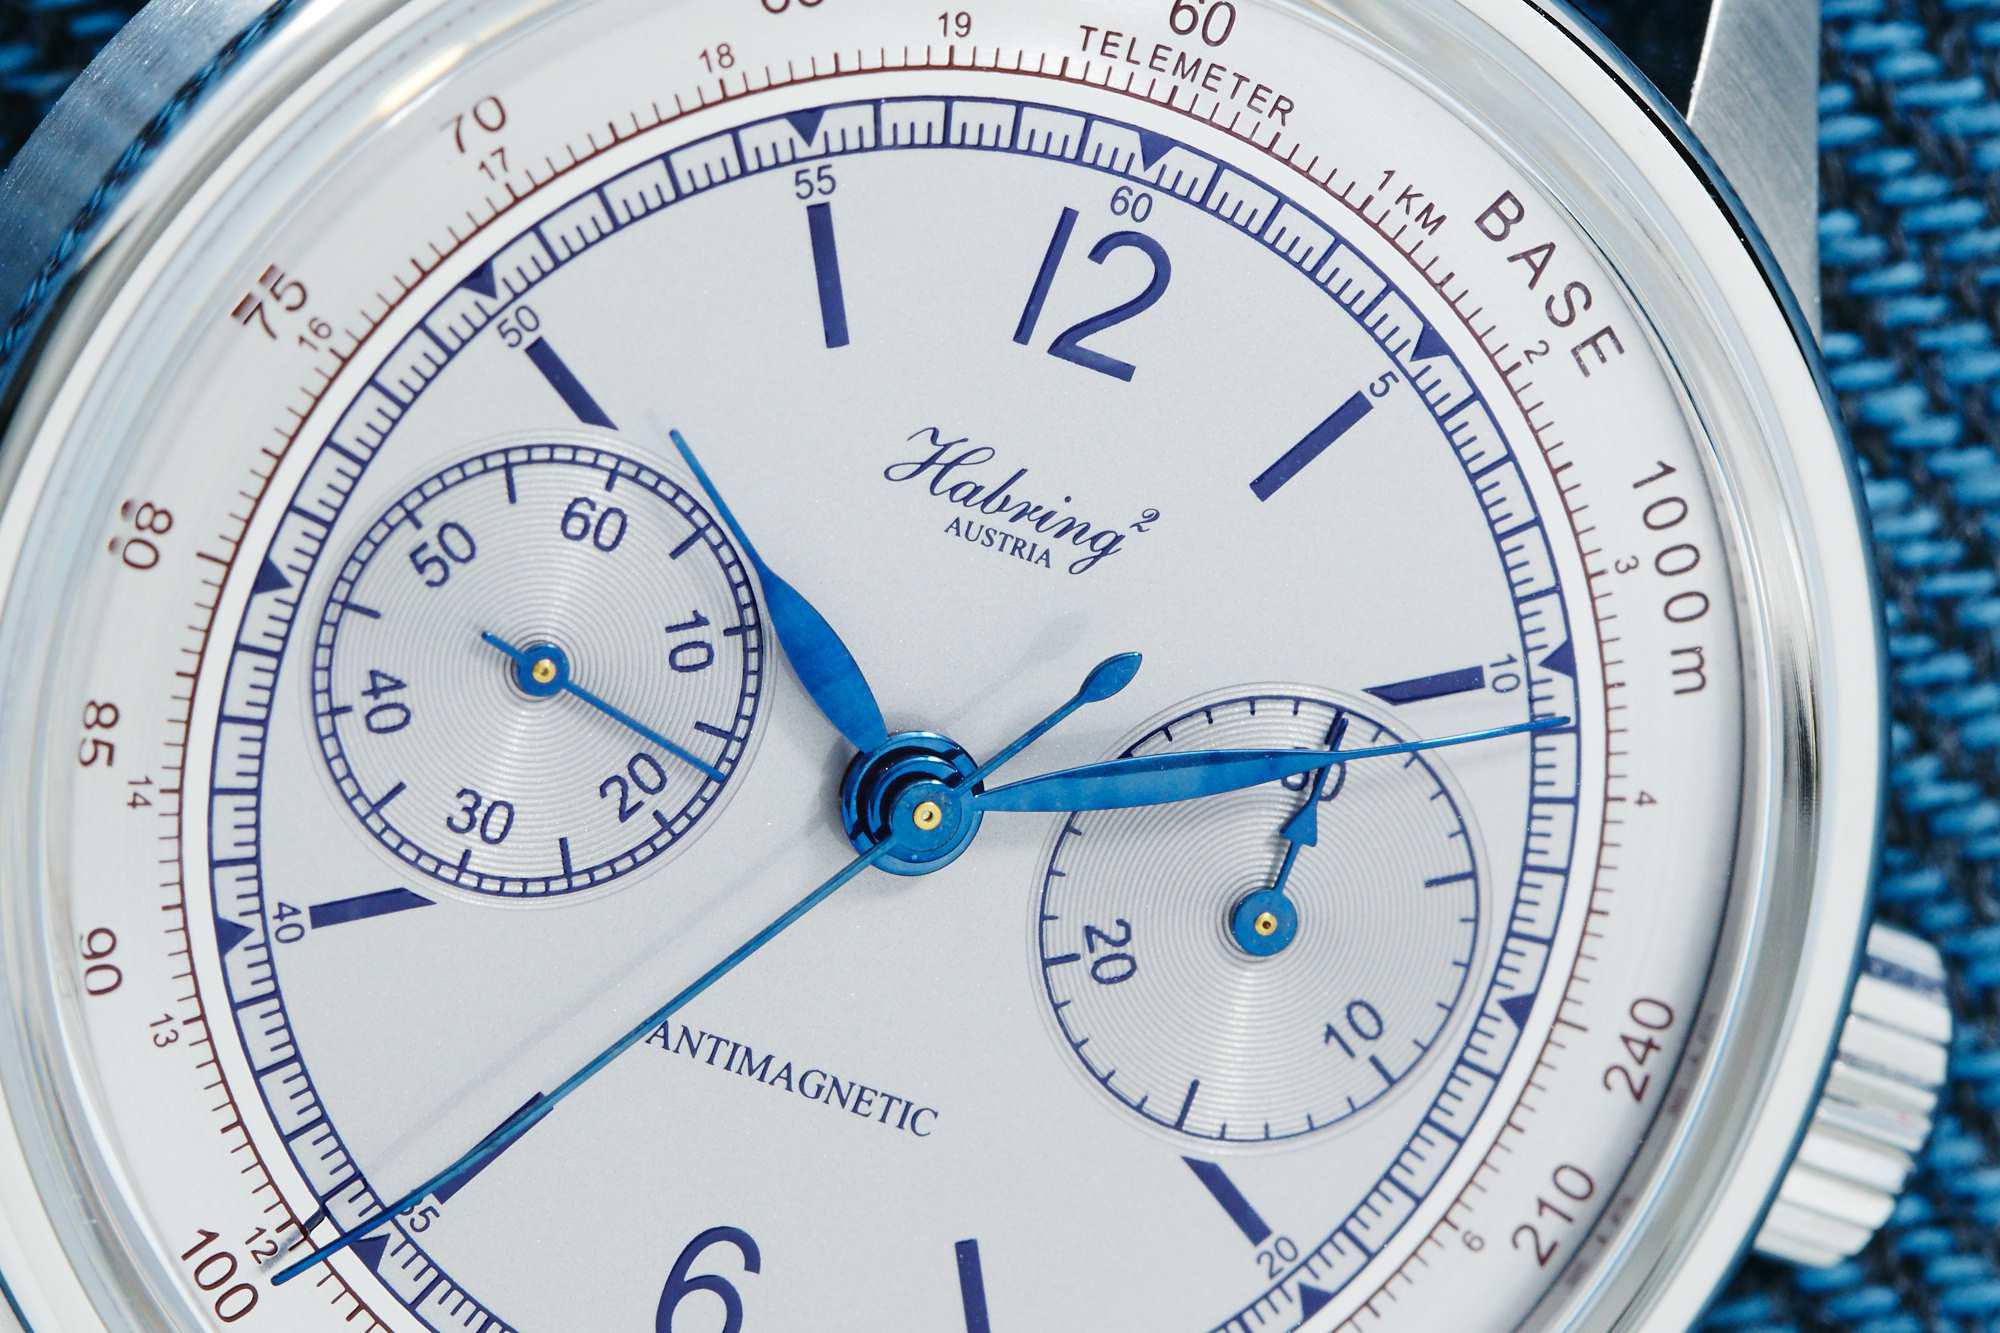 Habring2_Timezone_20th_Anniversary_Chronograph_site.jpg